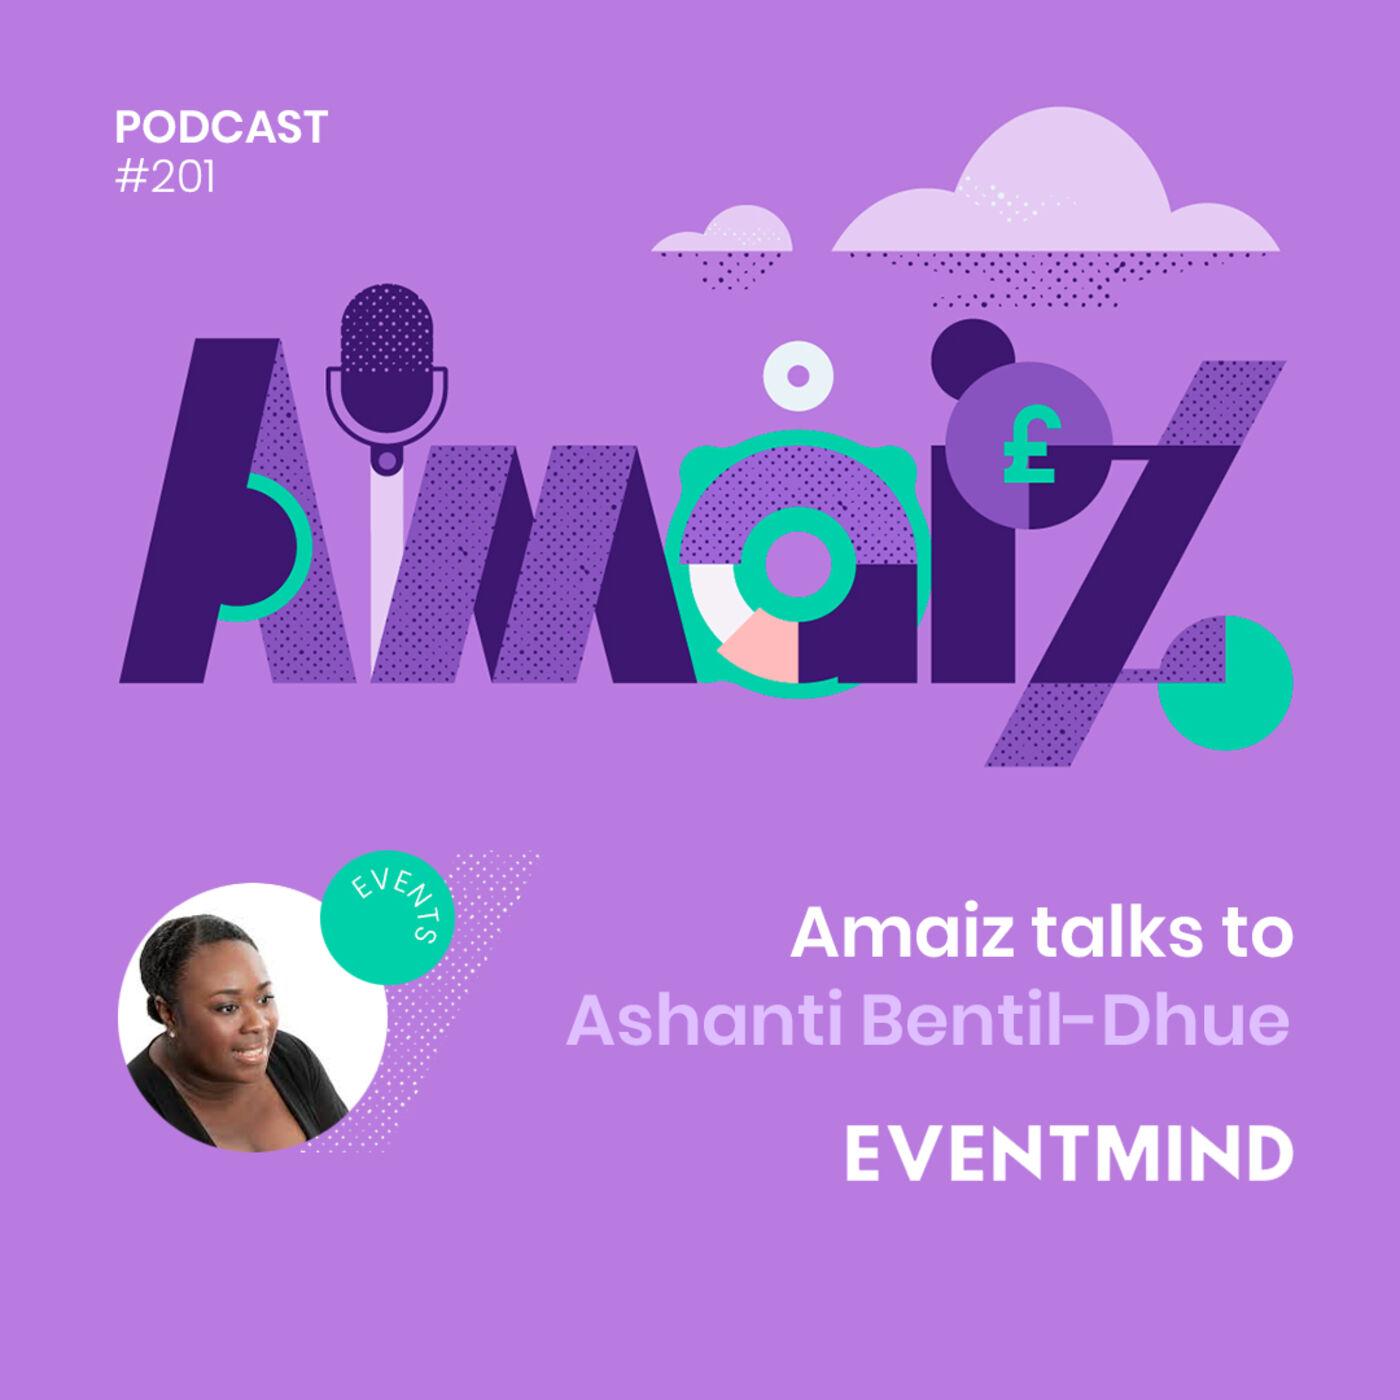 Business under Lockdown - Amaiz talks to Ashanti Bentil-Dhue of Eventmind